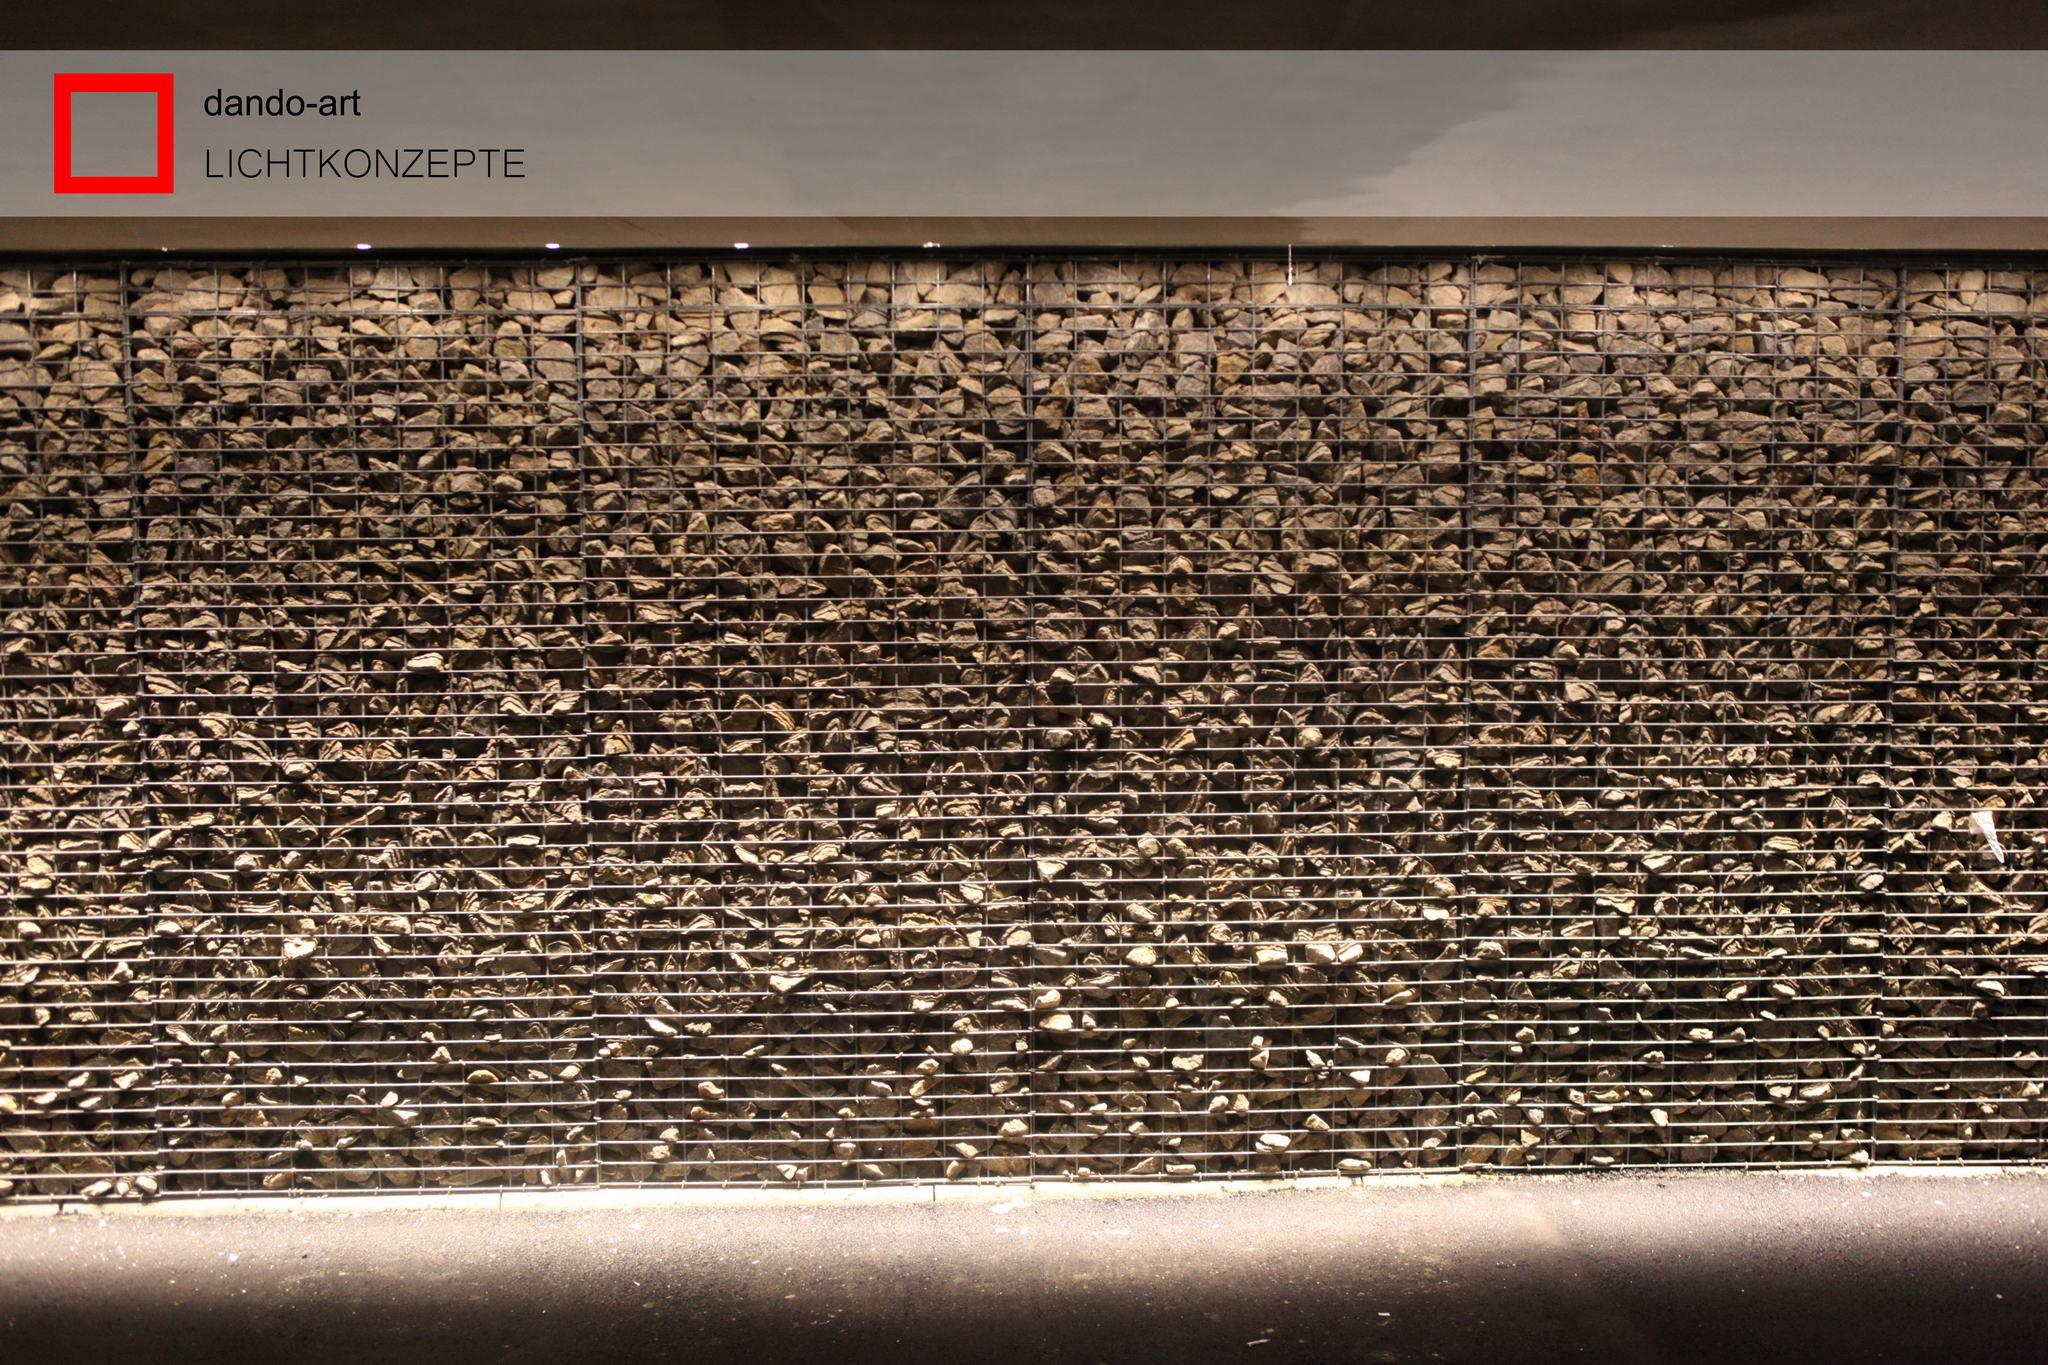 dando-art LED Wall zur Gabionenbeleuchtung